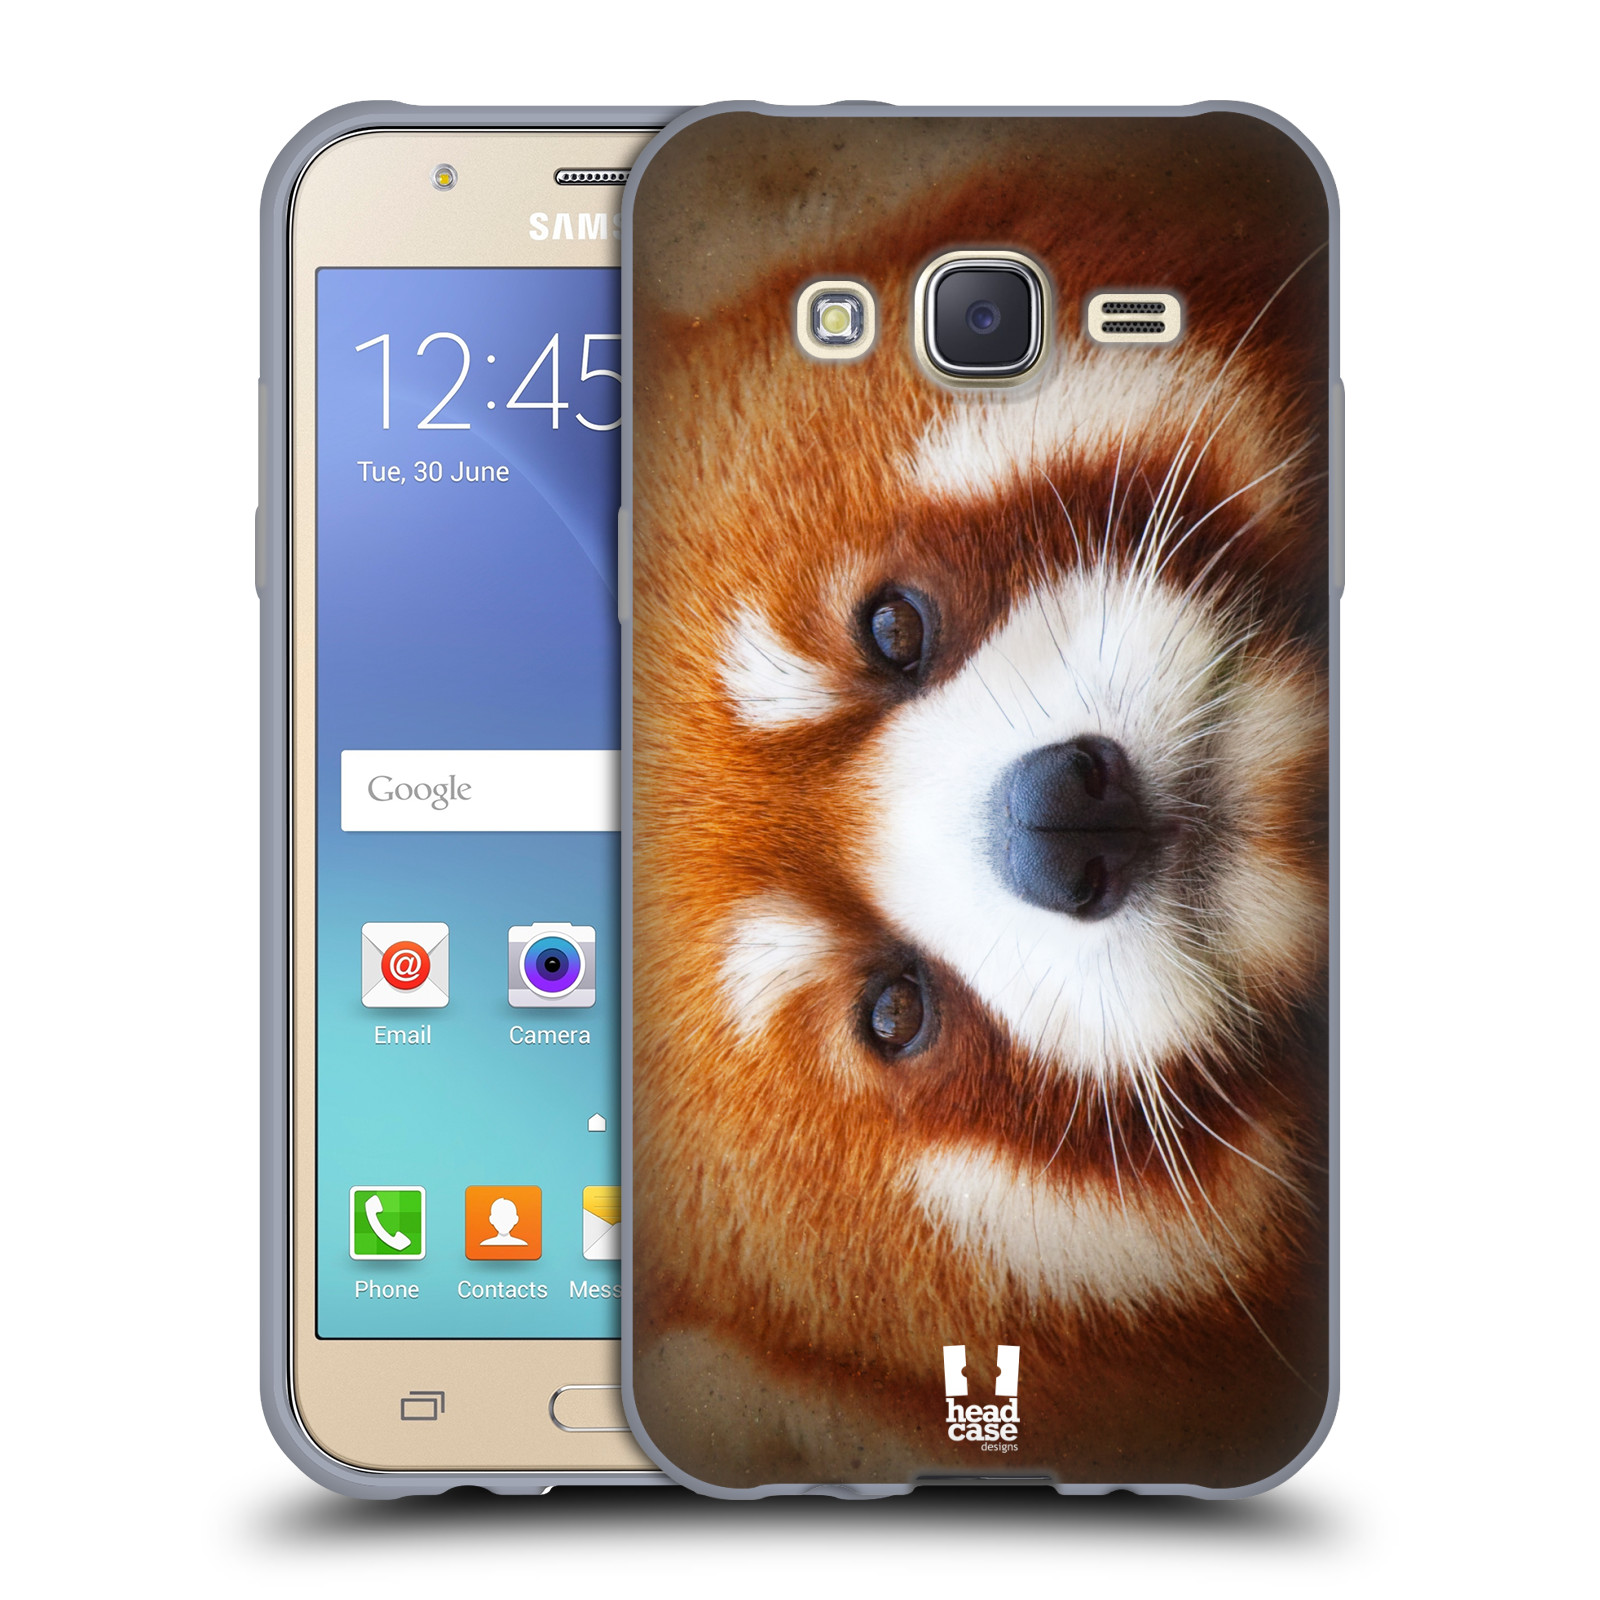 HEAD CASE silikonový obal na mobil Samsung Galaxy J5, J500, (J5 DUOS) vzor Zvířecí tváře 2 medvěd panda rudá